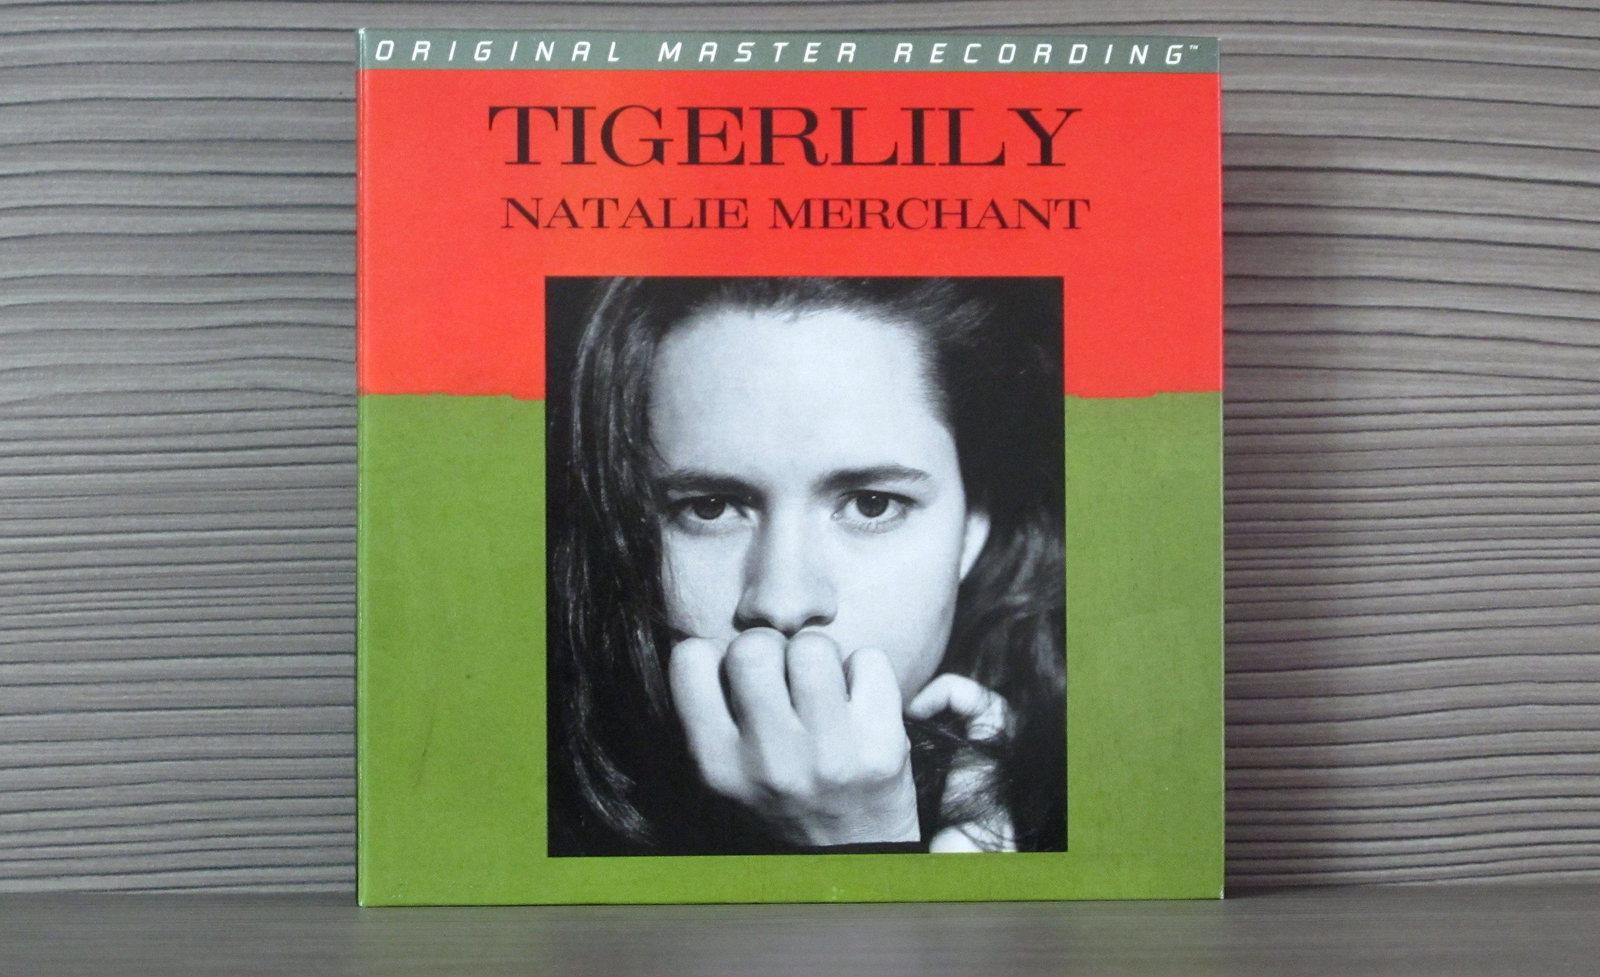 tigerlily natalie merchant - HD1600×977